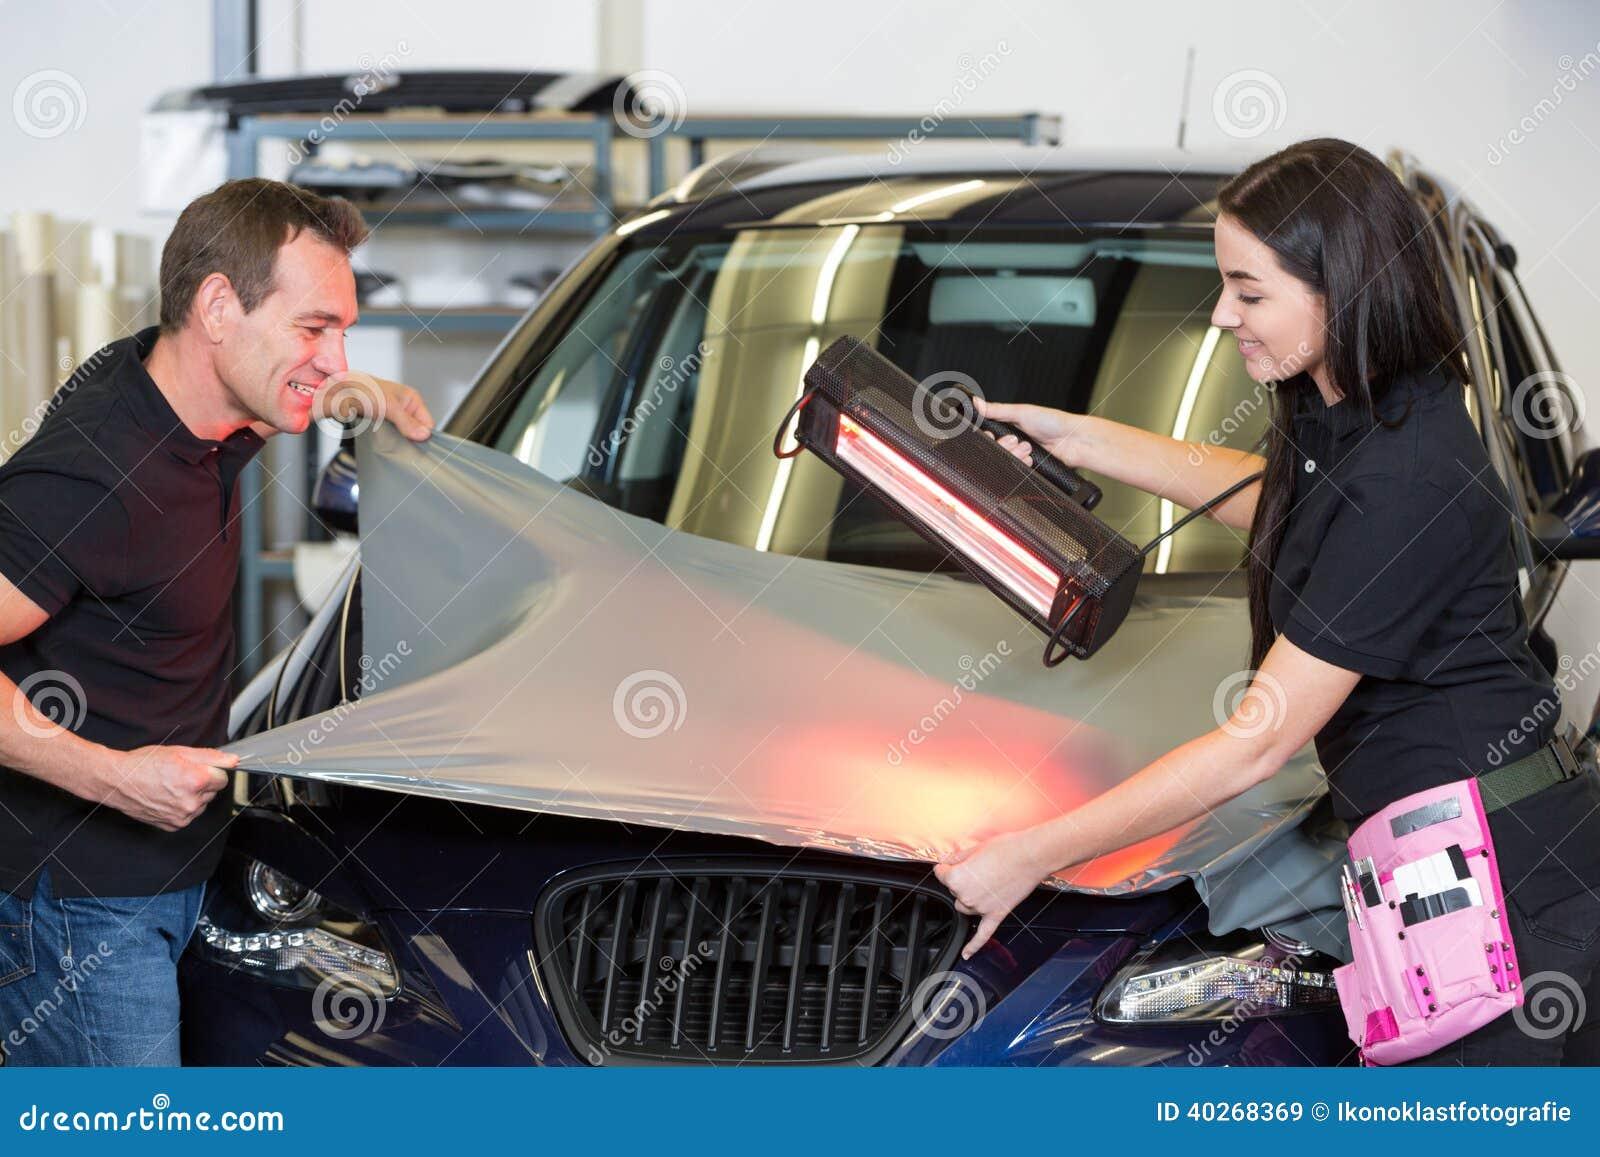 Rood Licht Lamp : Autoomslagen die rood lichtlamp gebruiken om vinylfilm af te